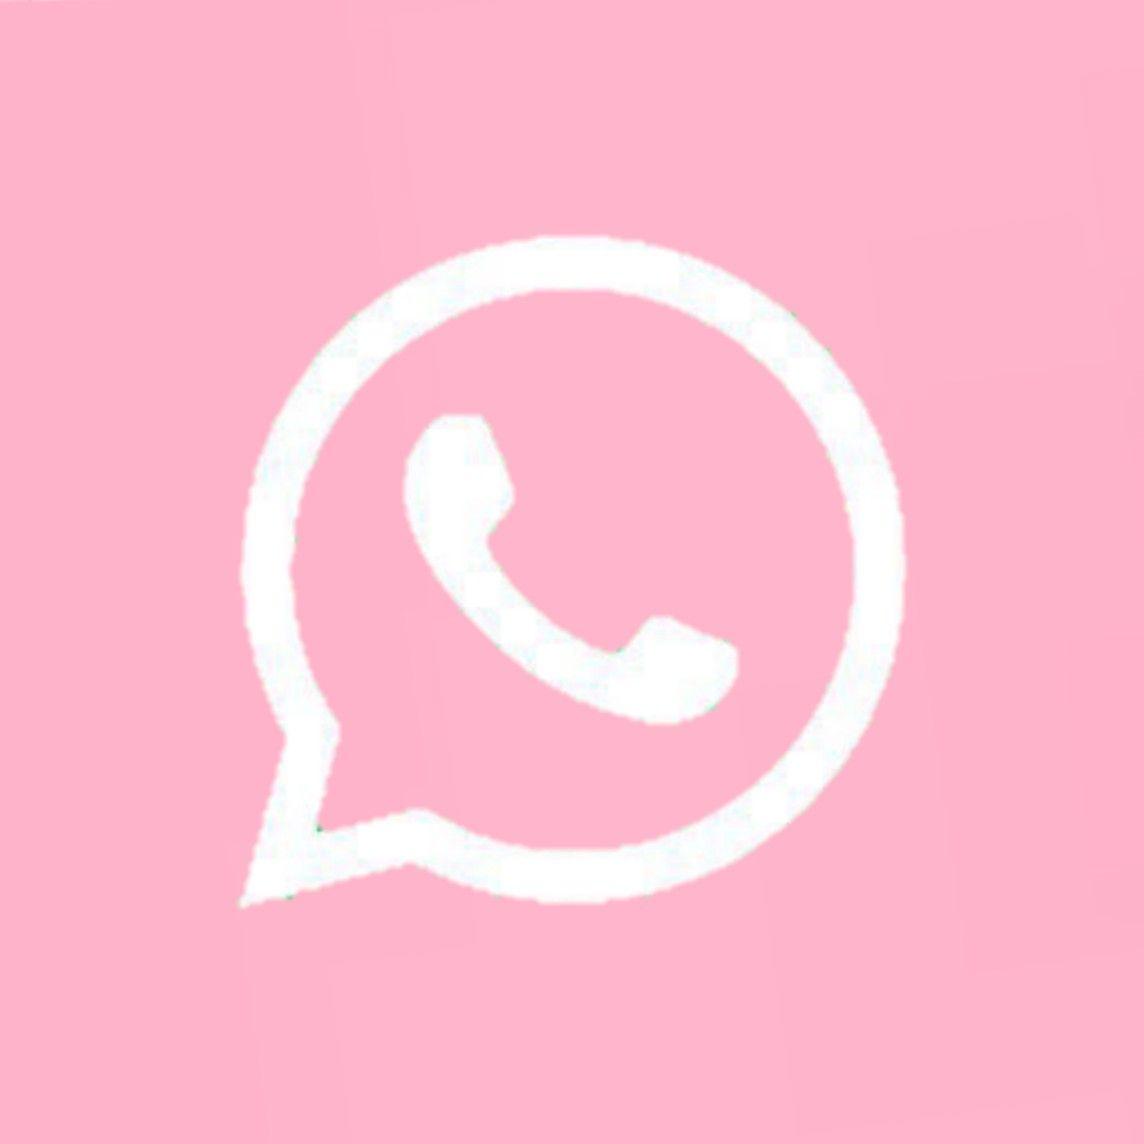 Whatsapp Pink In 2020 Iphone Wallpaper Girly Iphone Homescreen Wallpaper Iphone Logo